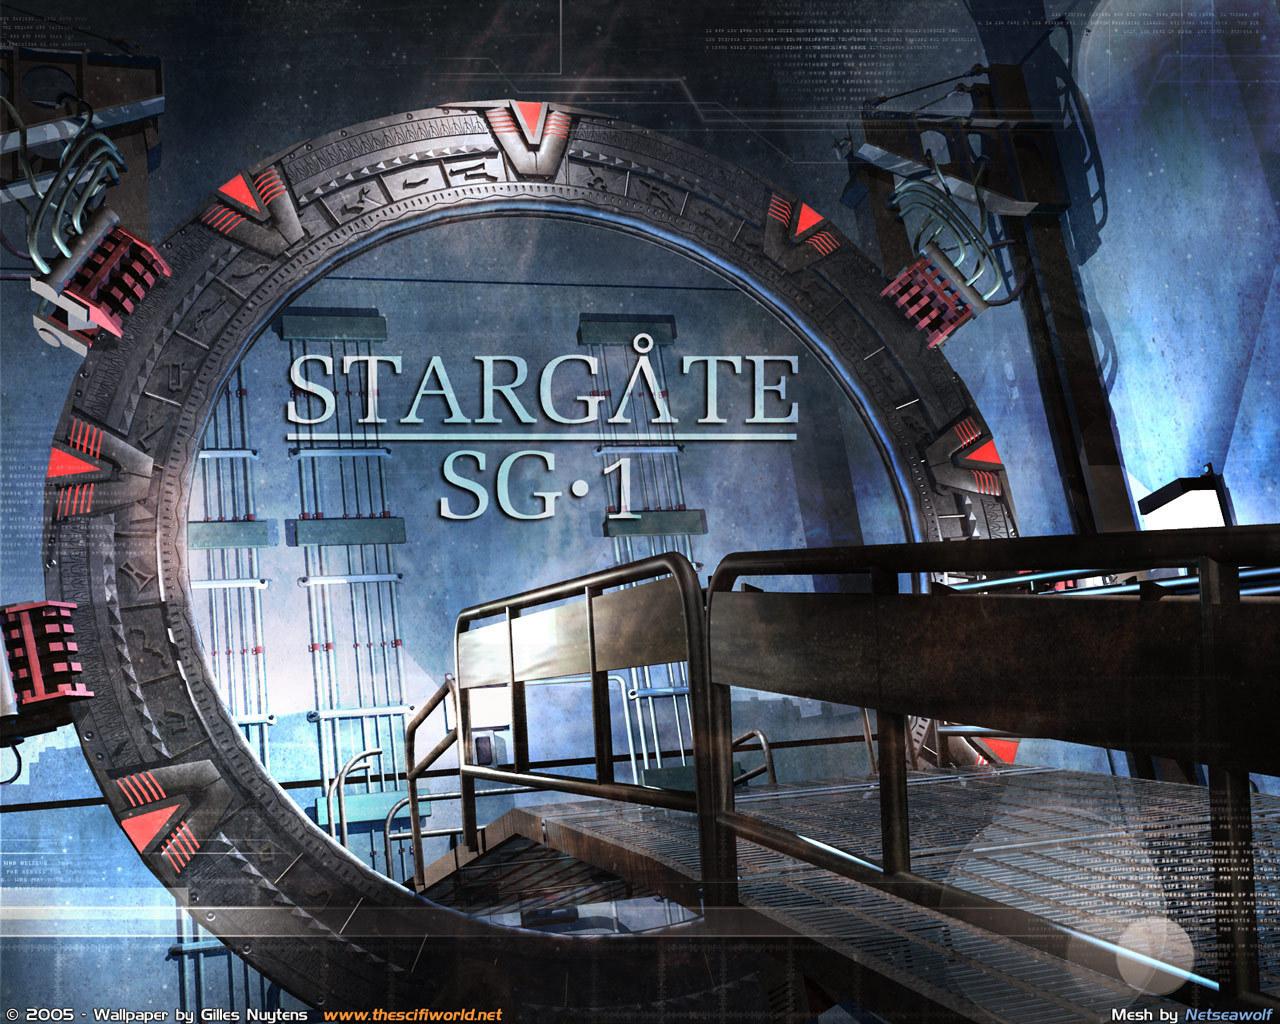 Stargate SG-1: The Illustrated Companion, Seasons 7 and 8